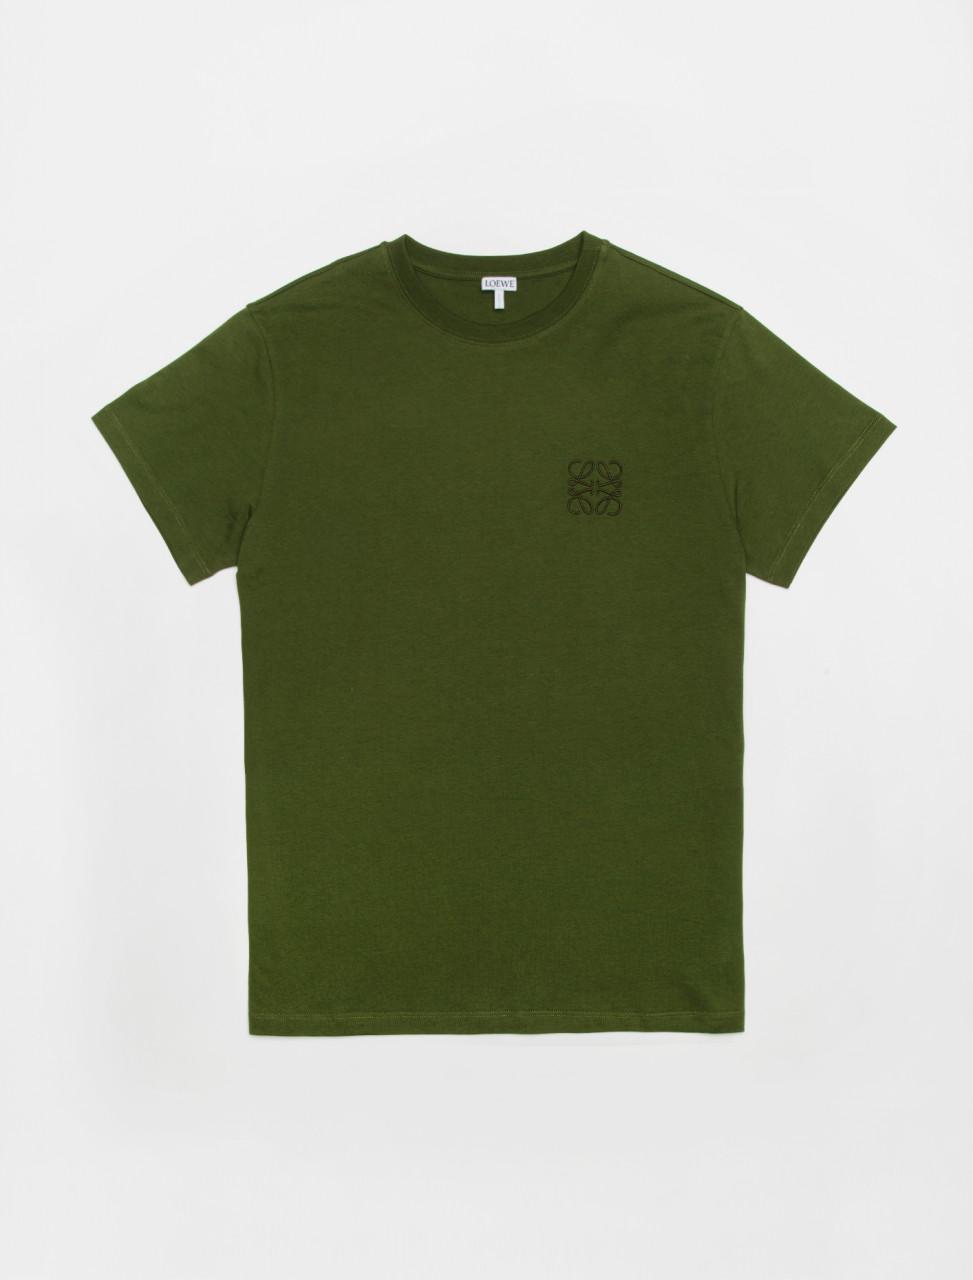 Anagram T-Shirt in Khaki Green